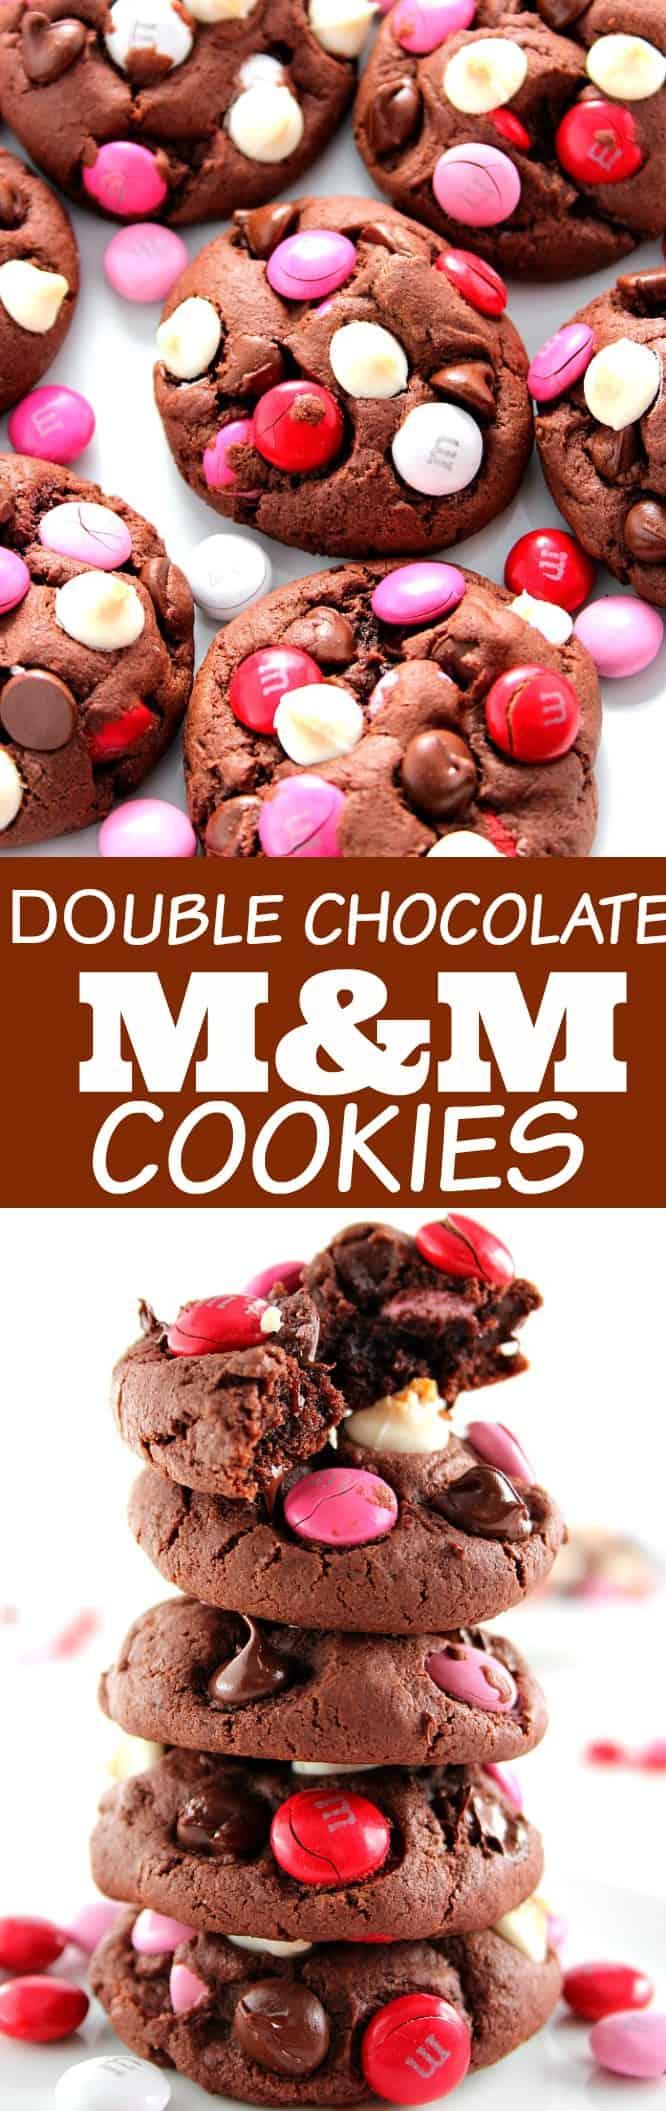 vday cookies long Double Chocolate M&M Cookies Recipe